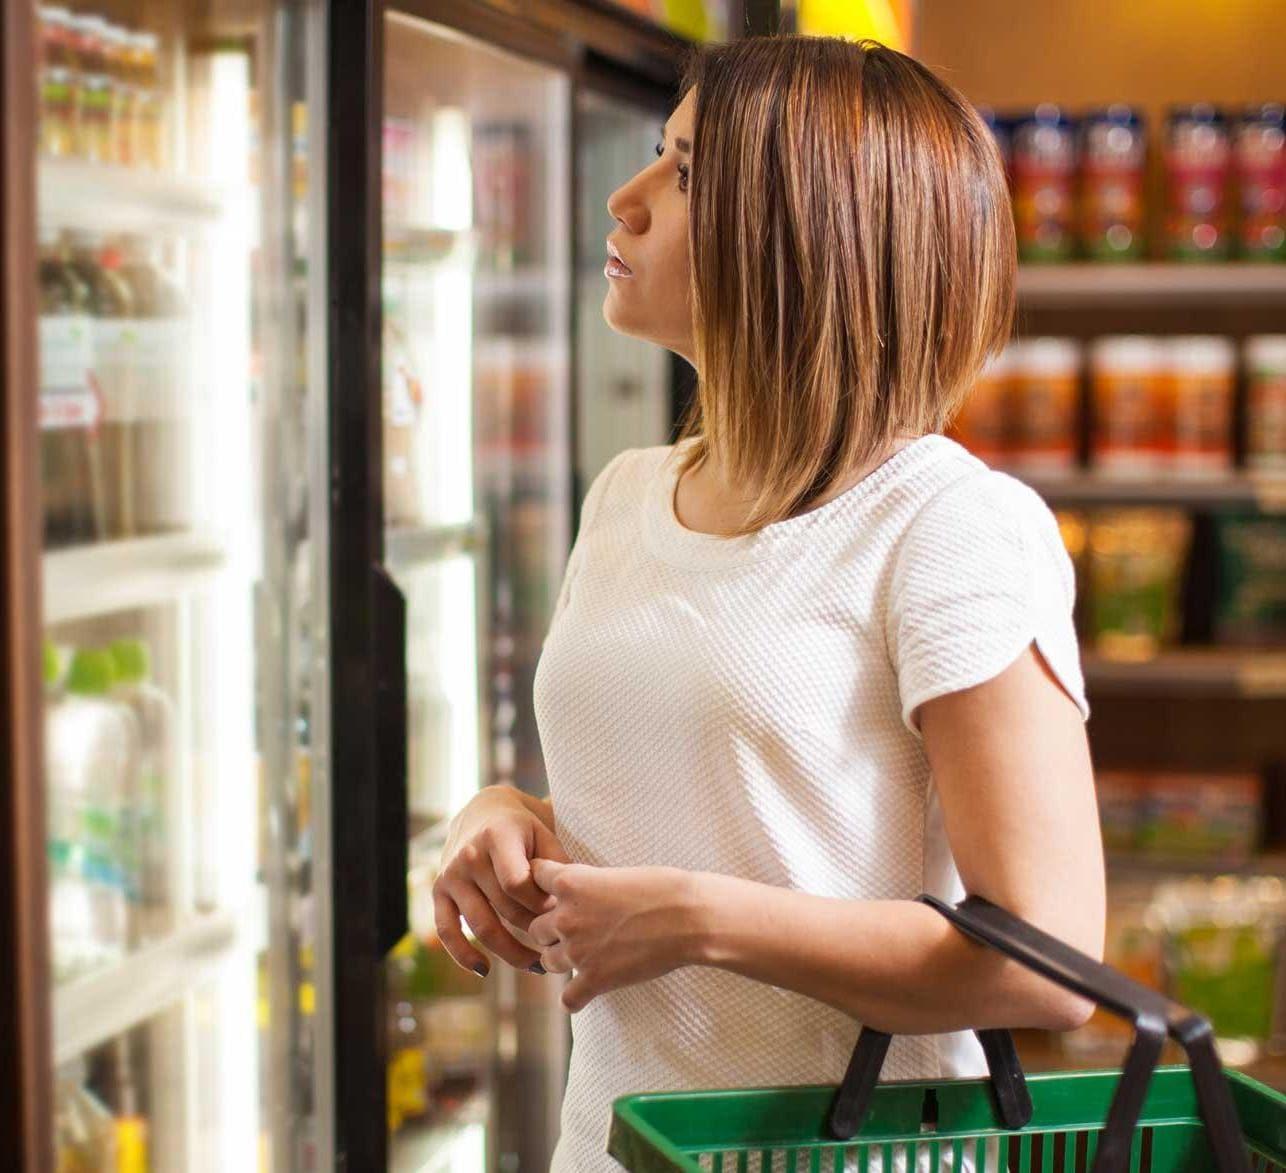 Woman shopping in supermarket fridge